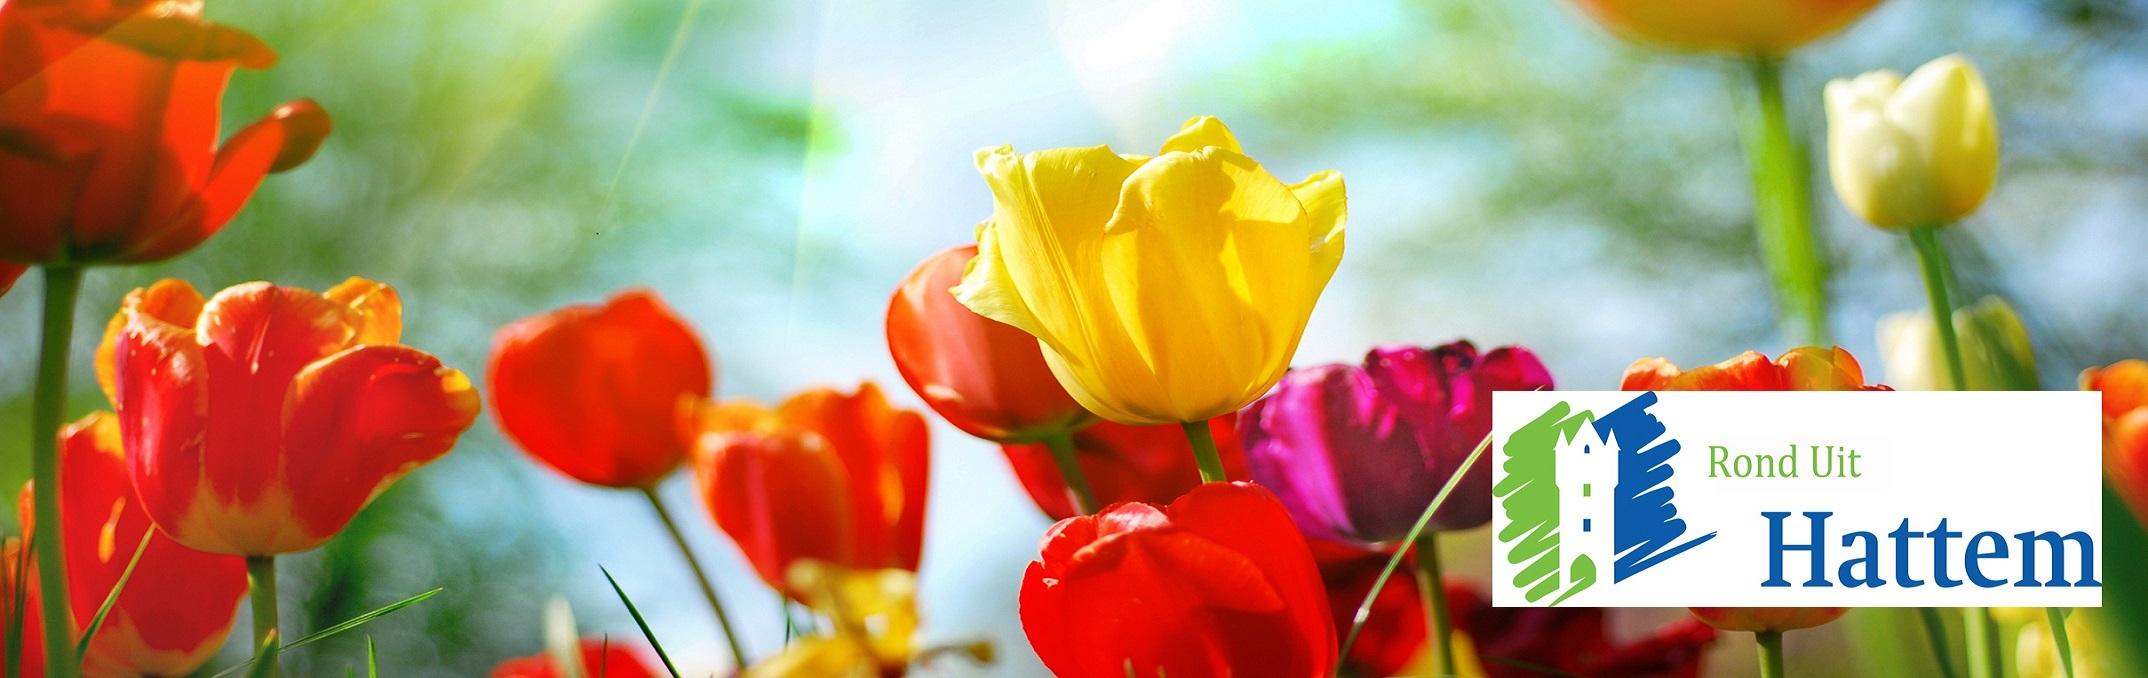 Primavera Lentemarkt Hattem